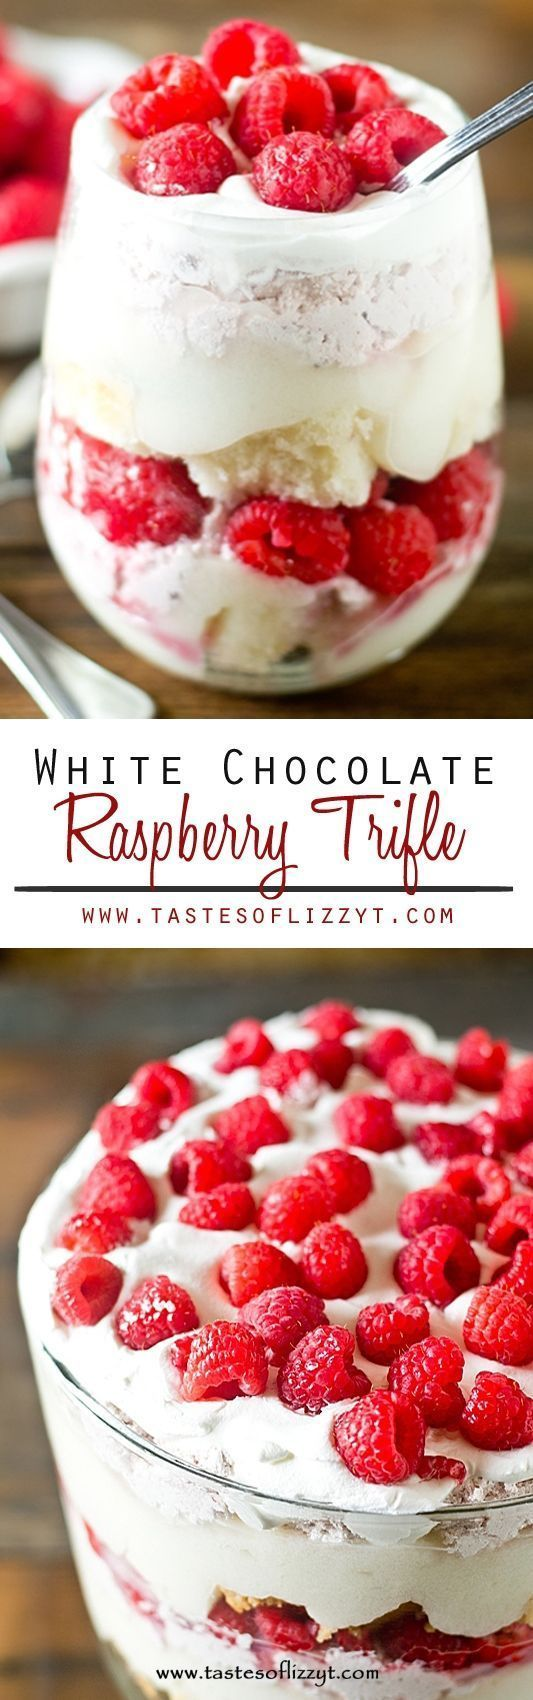 White Chocolate Raspberry Trifle - Layers of cake, white chocolate pudding and raspberry cream.